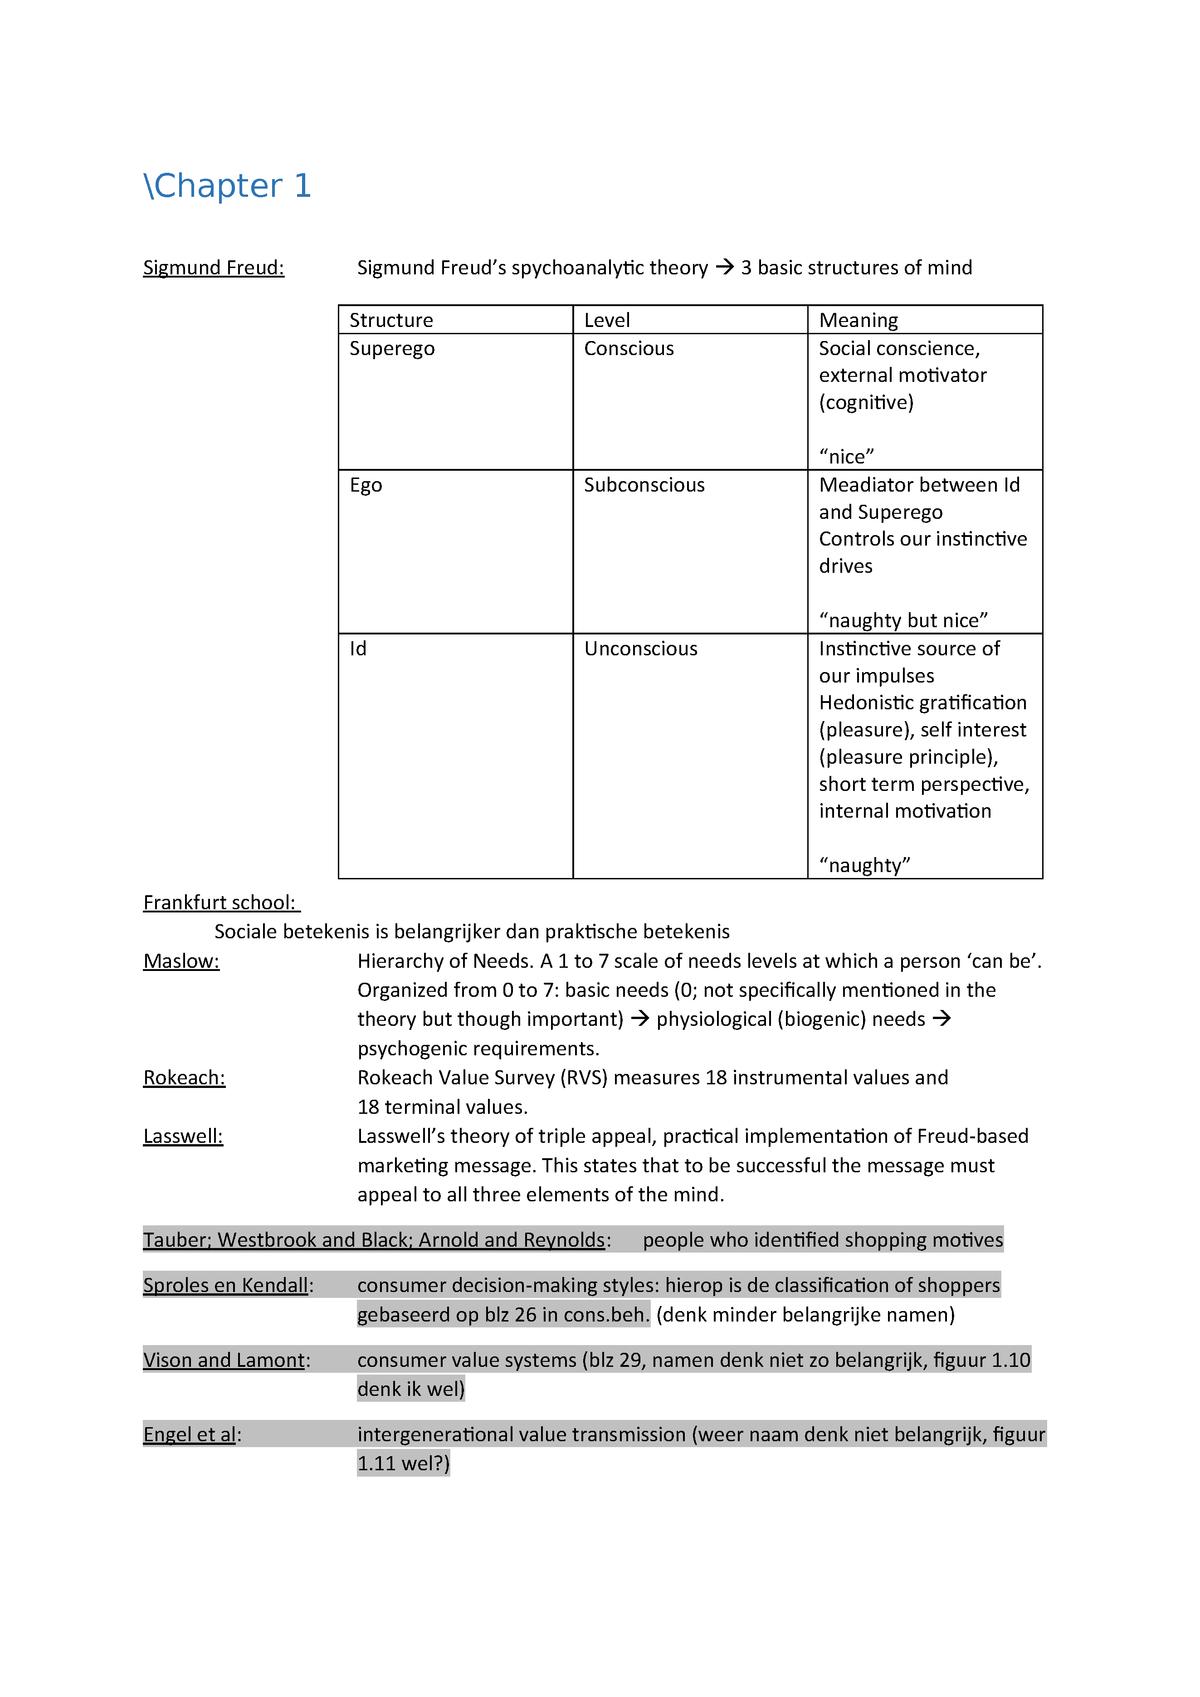 Summary IO1020-12 IO1020-12 21 Dec 2016 - StuDocu